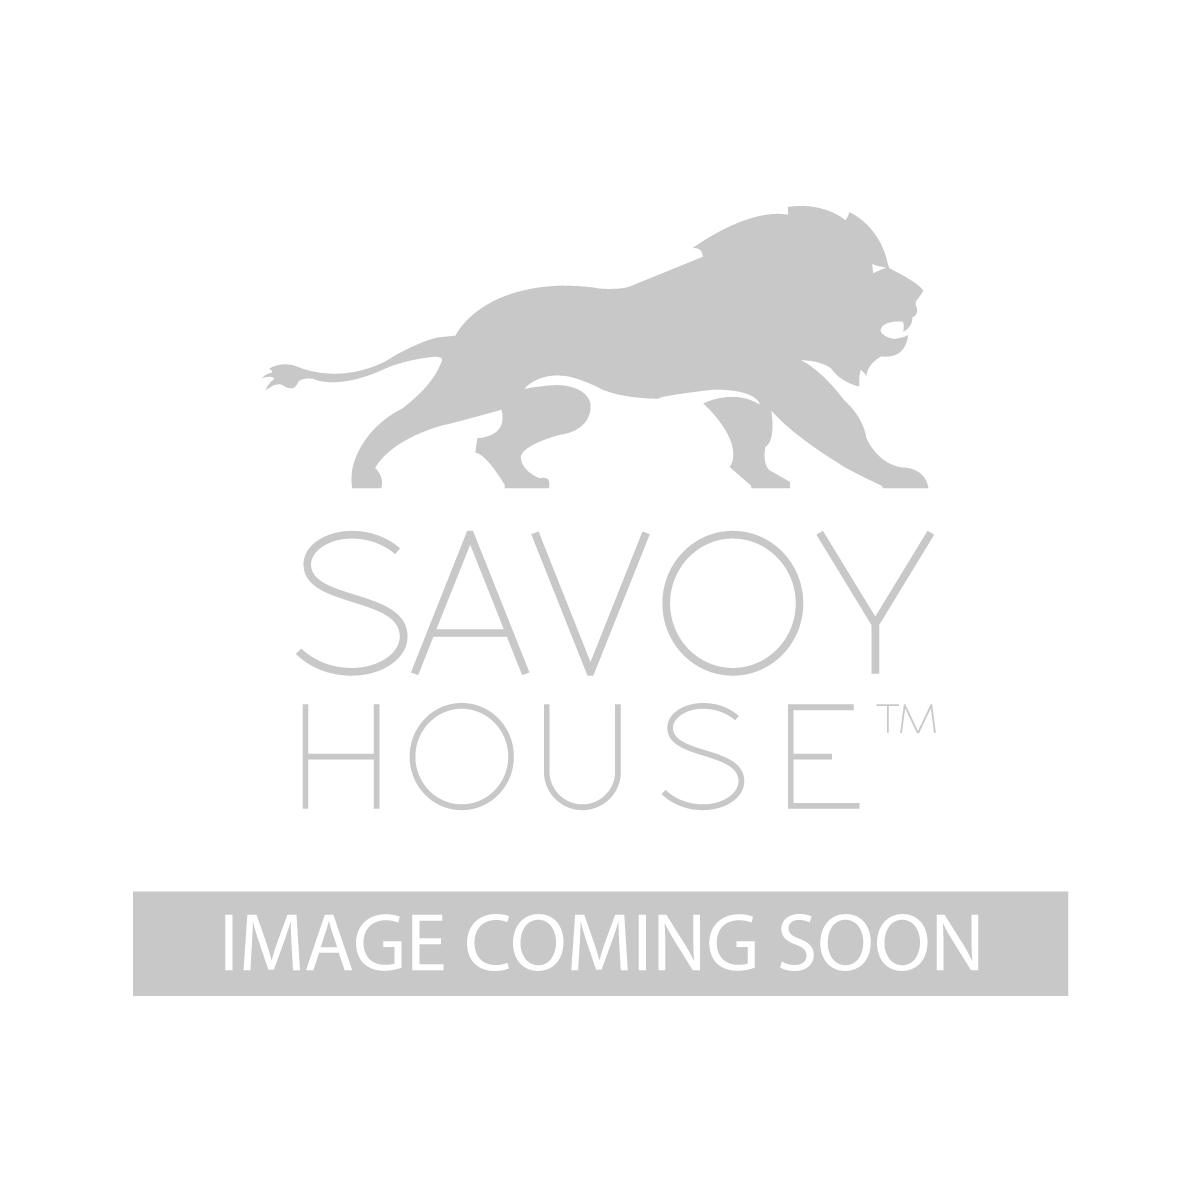 1 874 3 109 ballard 3 light mini chandelier by savoy house ballard 5 light chandelier arubaitofo Image collections